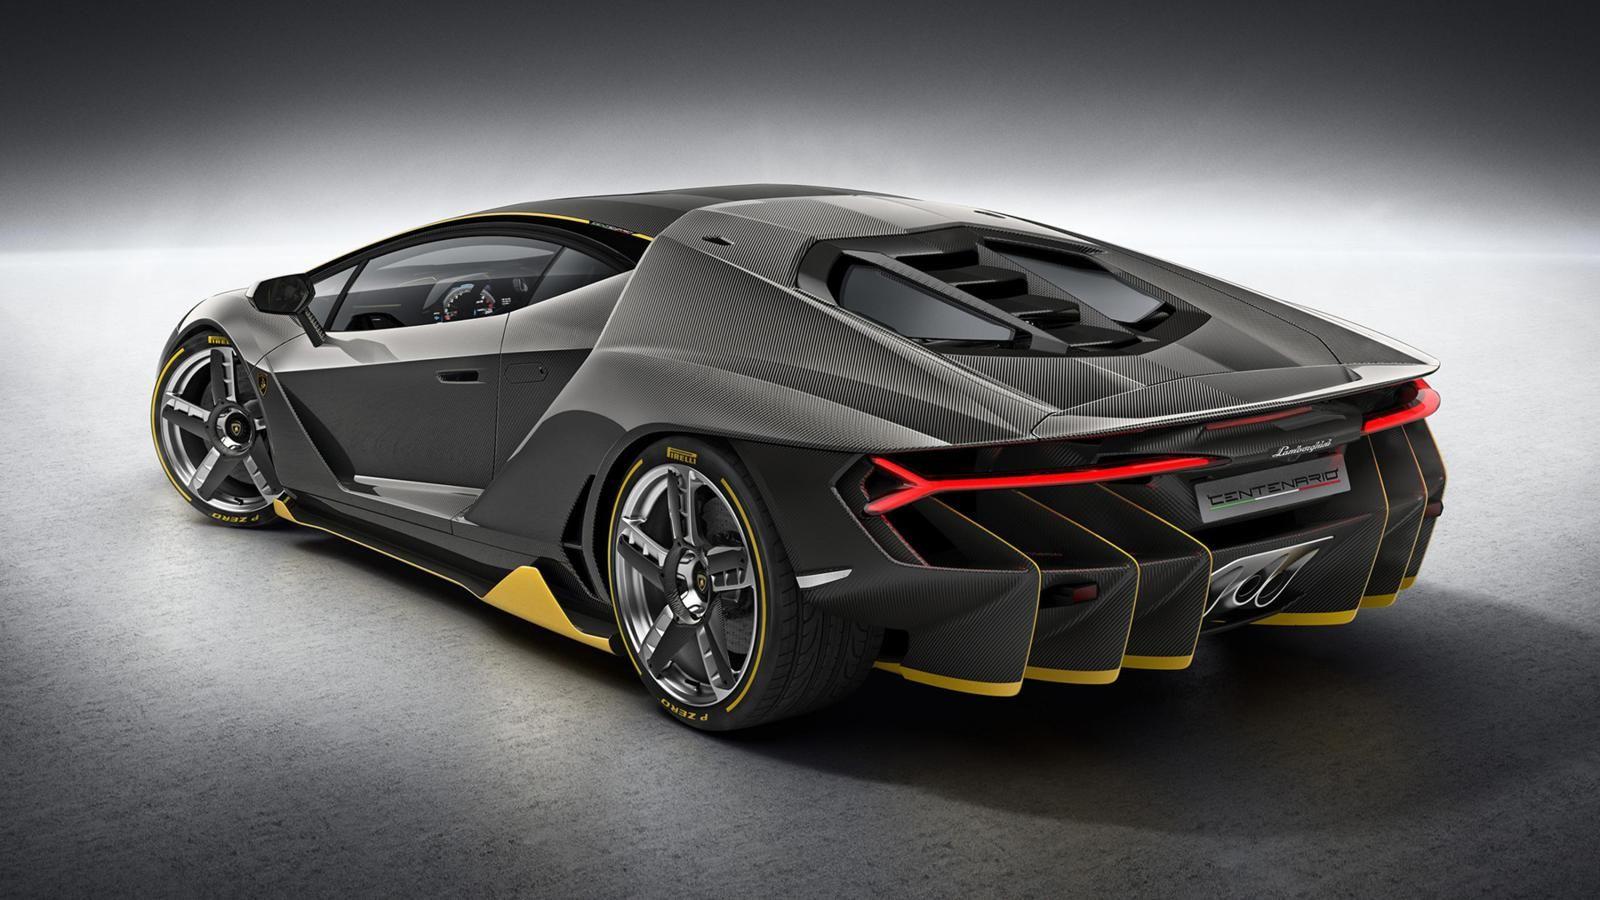 Lamborghini Builds The Ultimate Anti Ferrari Lamborghini Centenario Lamborghini Super Cars